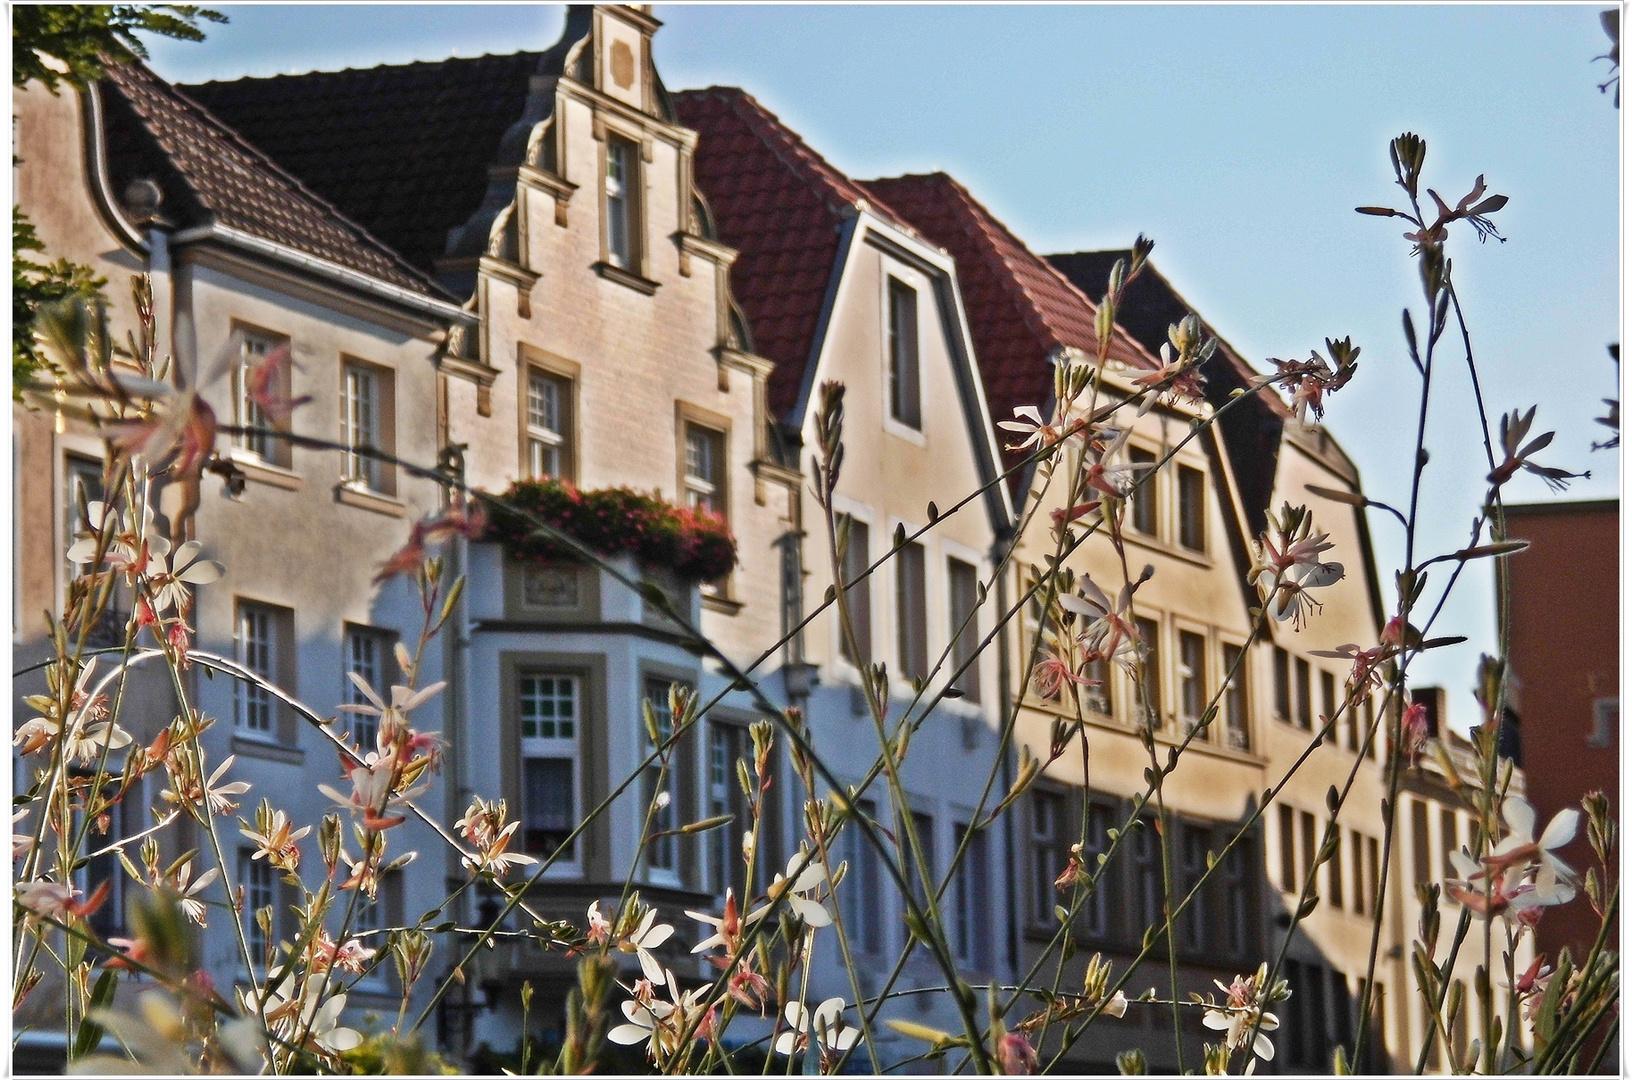 Fassaden am Warendorfer Marktplatz